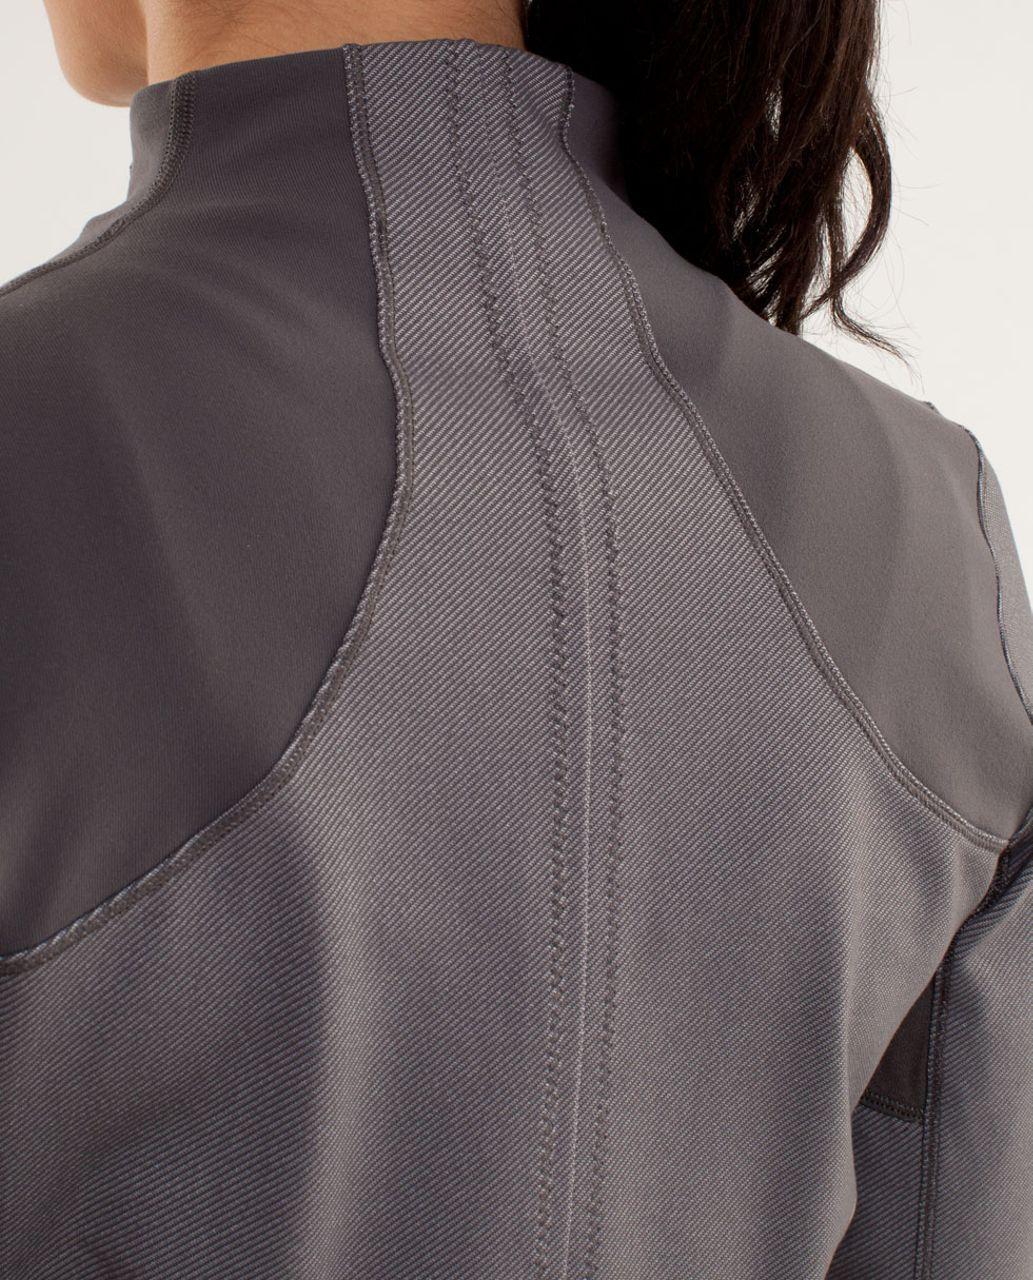 Lululemon Forme Jacket - Soot Light